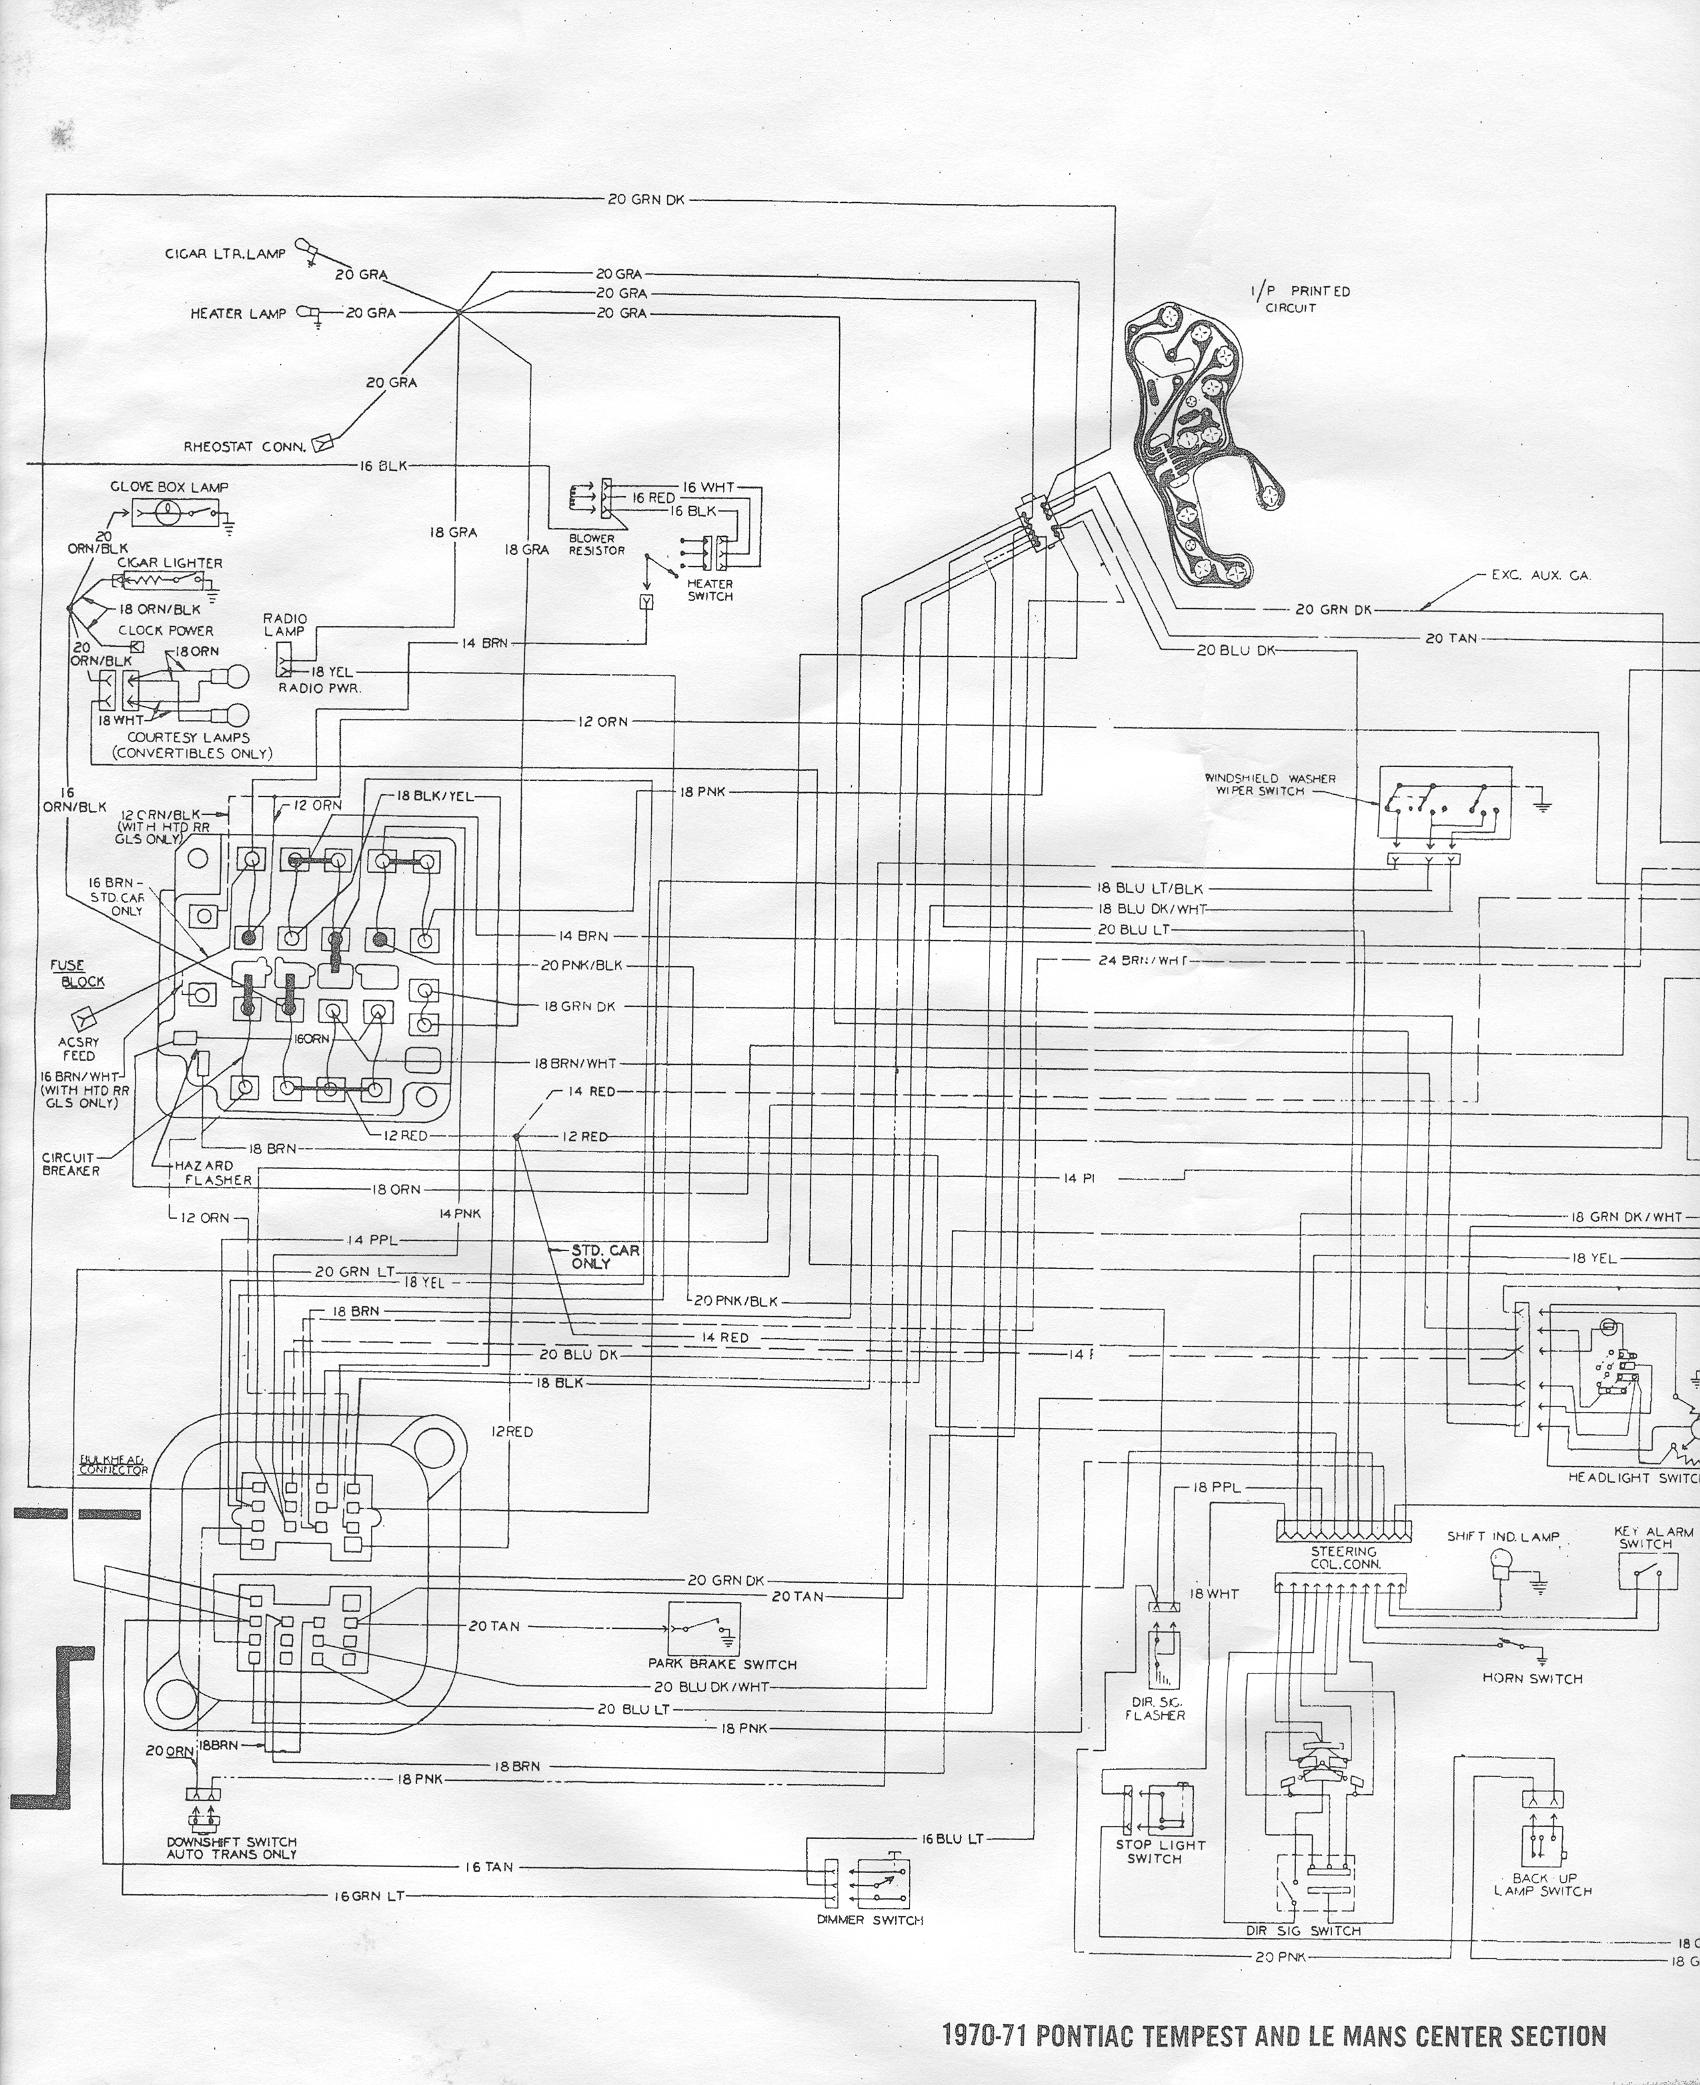 68 camaro wiring diagram images 1968 chevy camaro wiring diagram 1966 gto wiring diagram 1966 desconectices